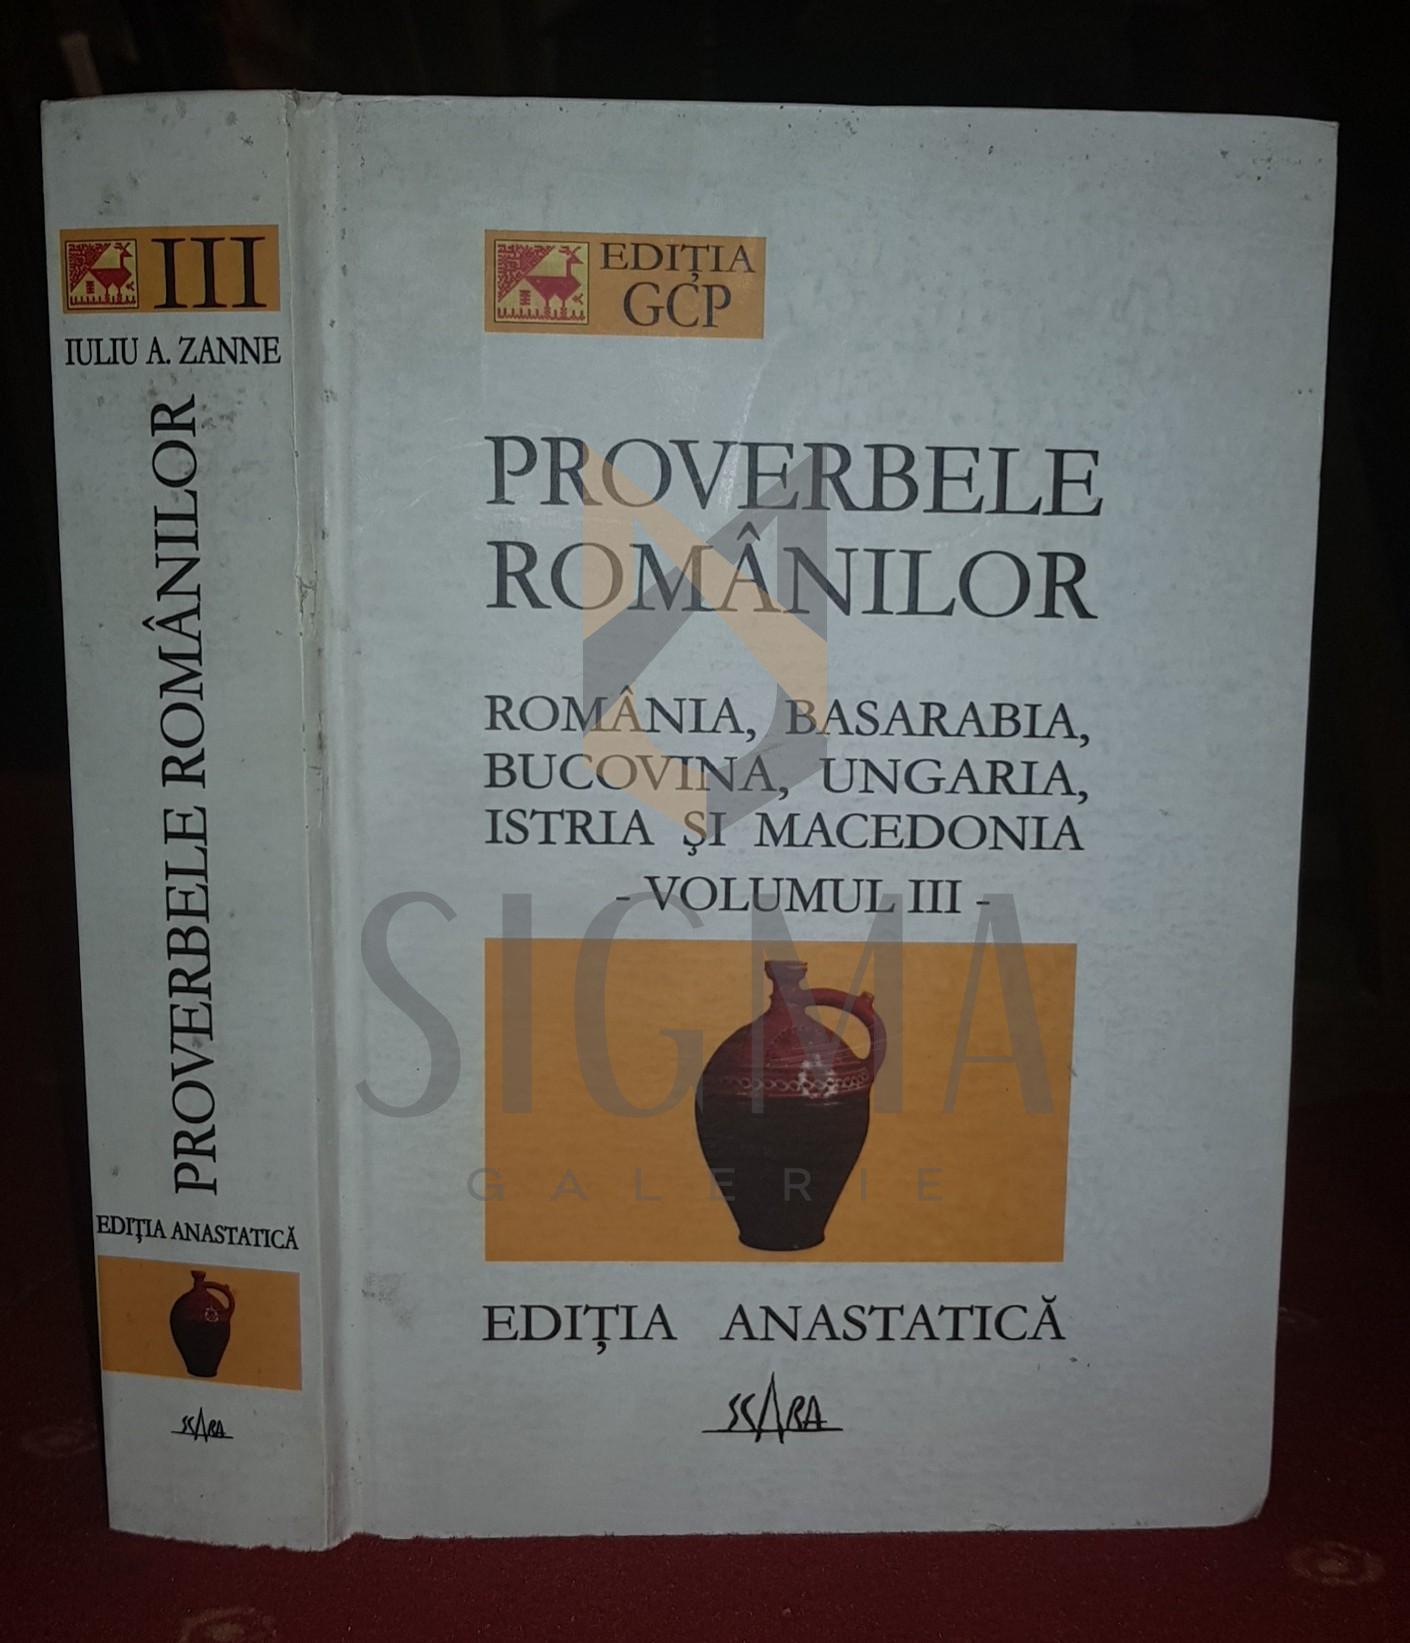 ZANNE A. IULIU (Editie Ingrijita de MUGUR VASILIU)